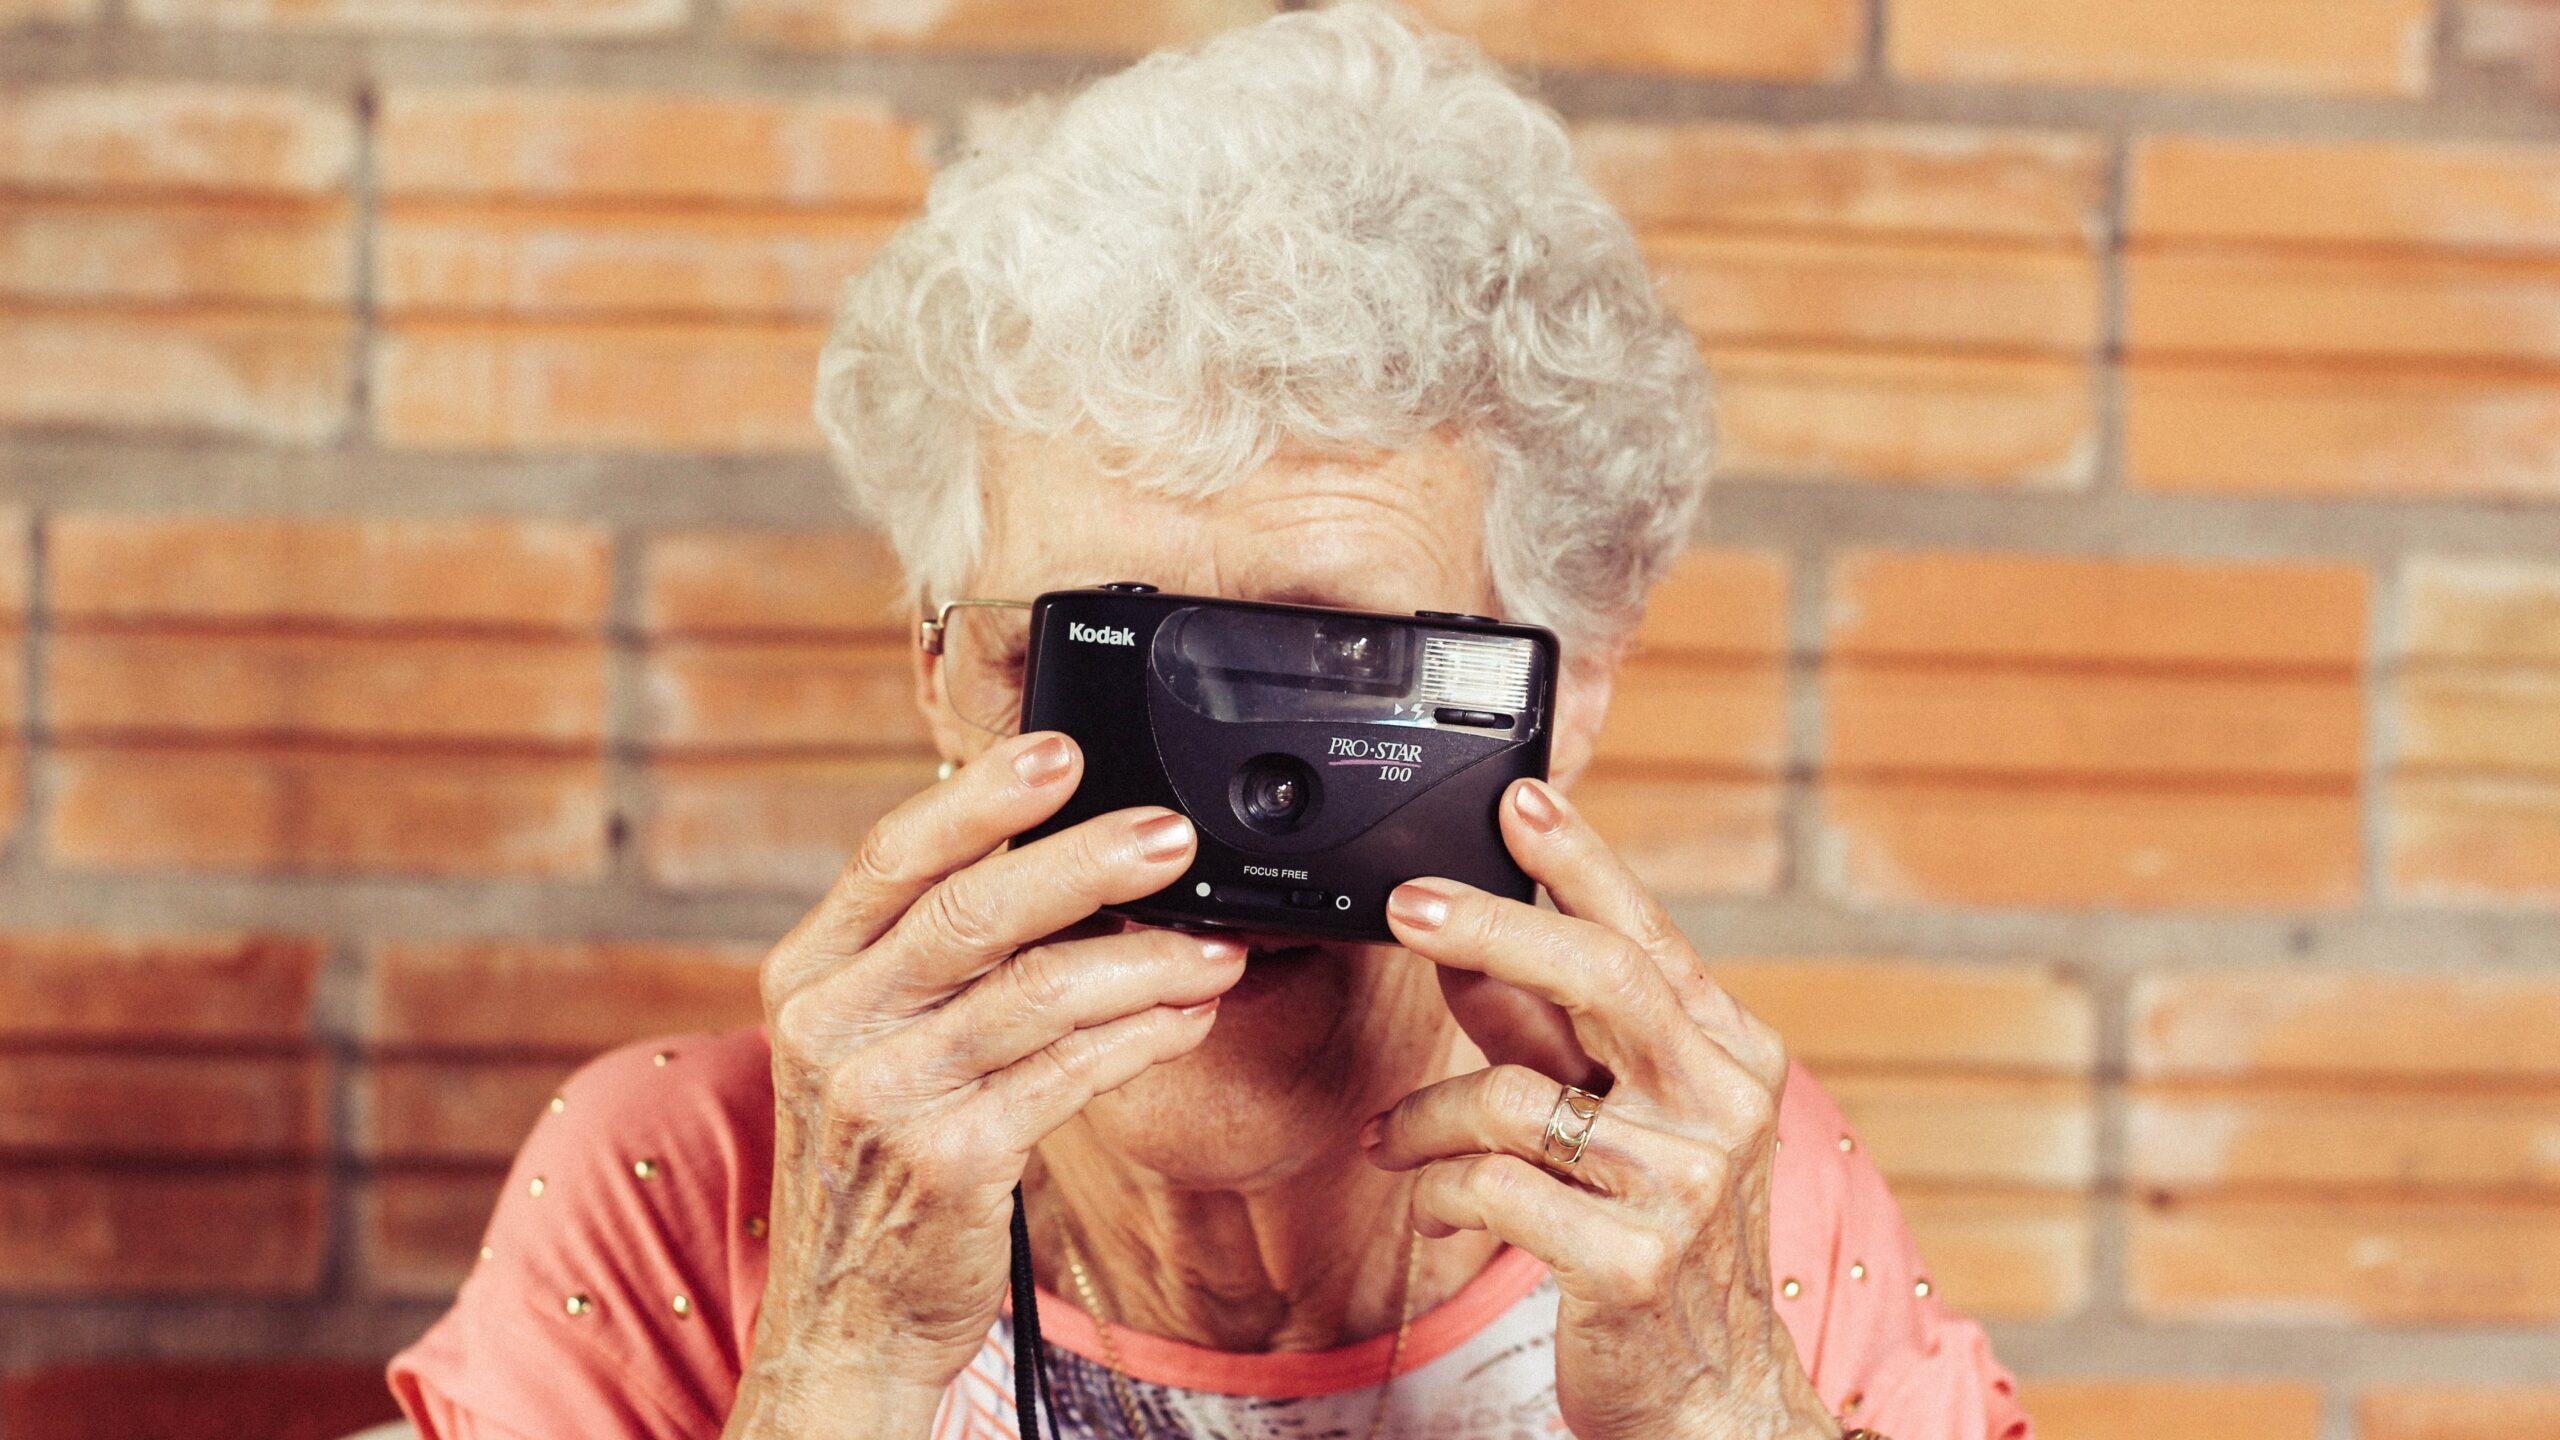 Elderly woman taking a photo